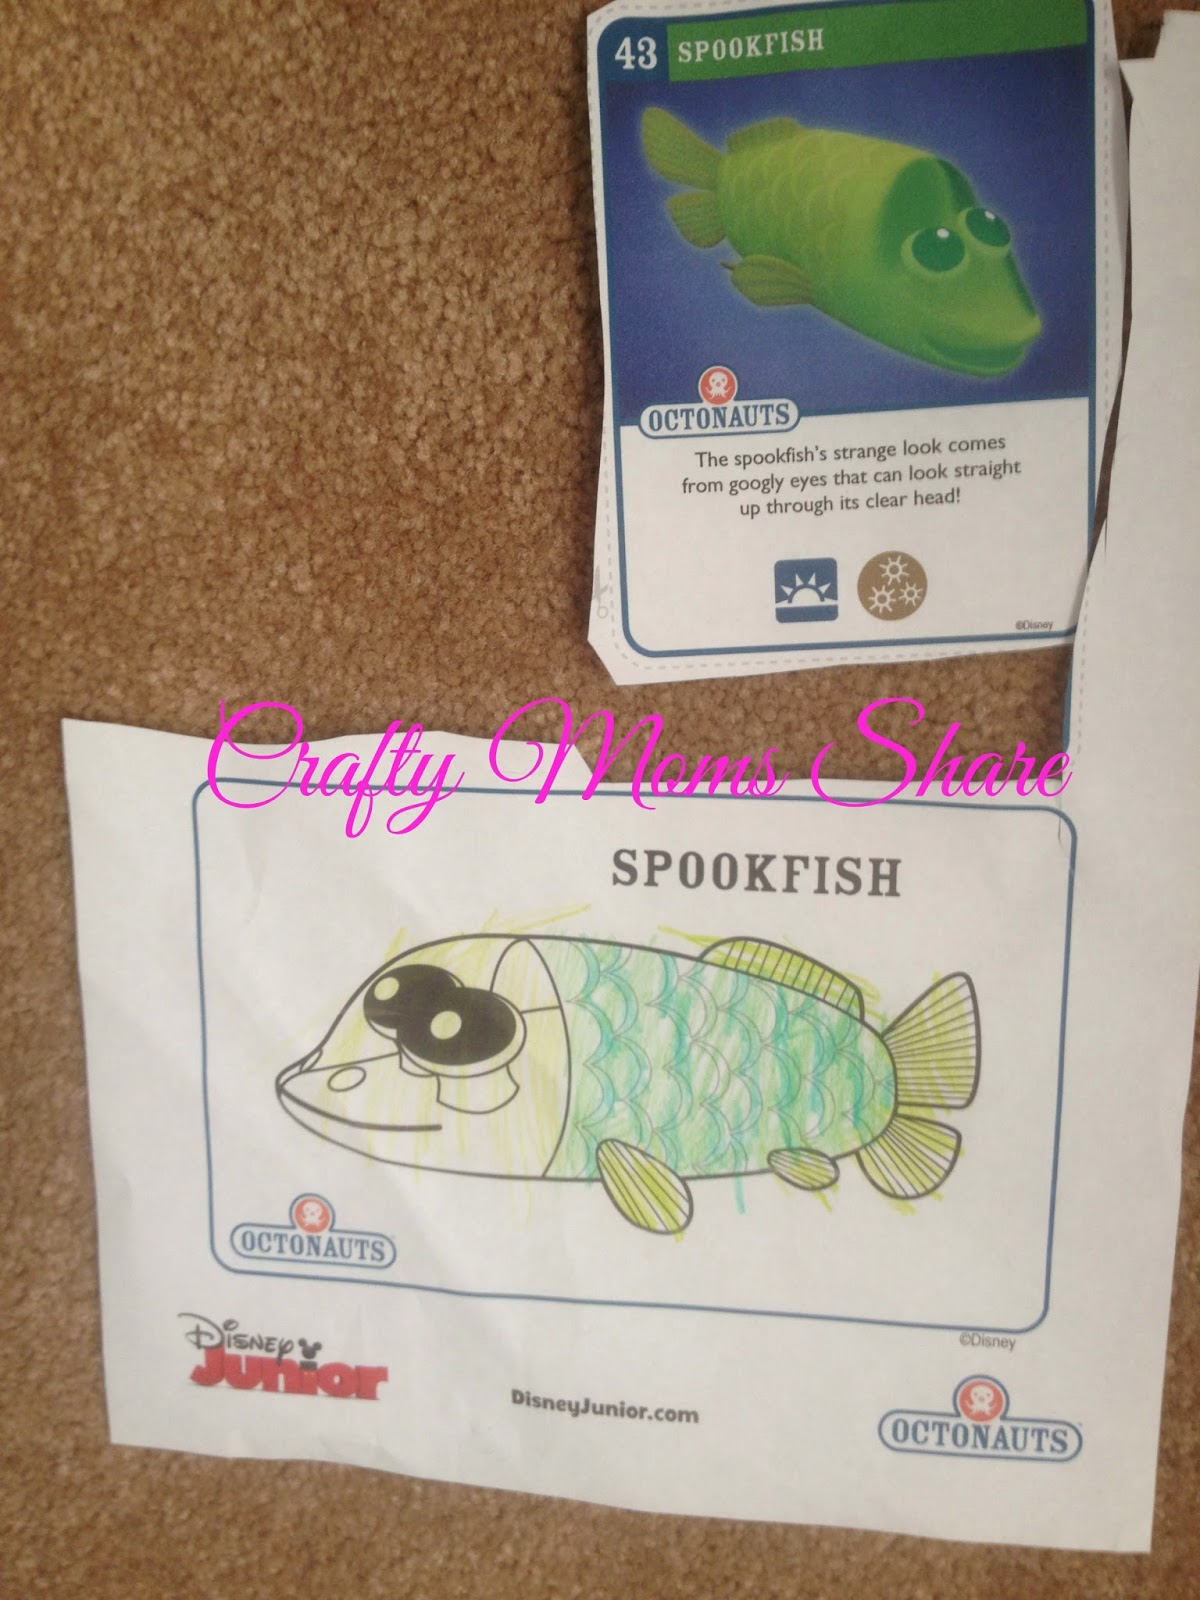 http://disneyjunior.com/print/spookfish-4e468b1cf46b0c1adffca3b3